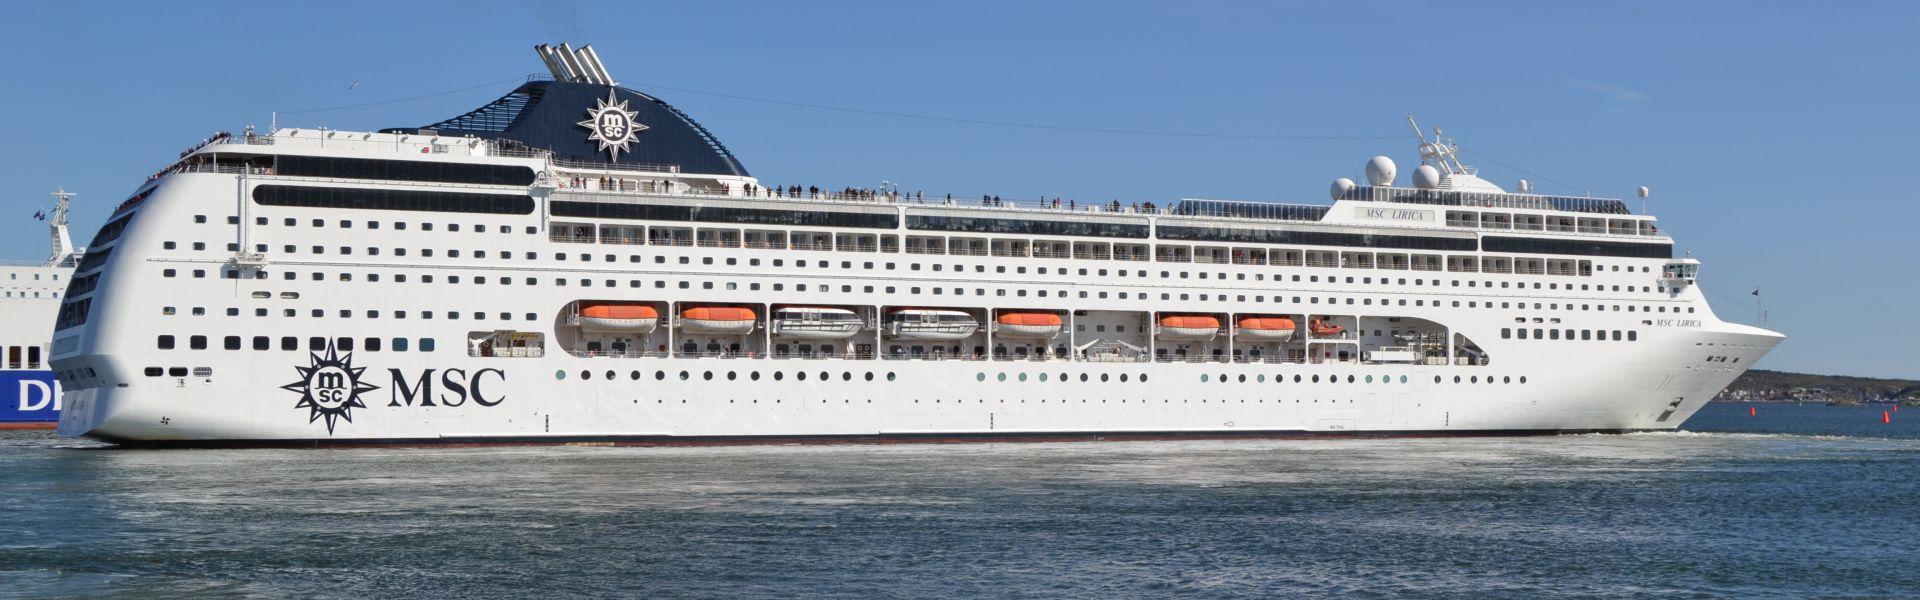 Croaziera 2018 - Mediterana de Est (Bari) - MSC Cruises - MSC Lirica - 7 nopti